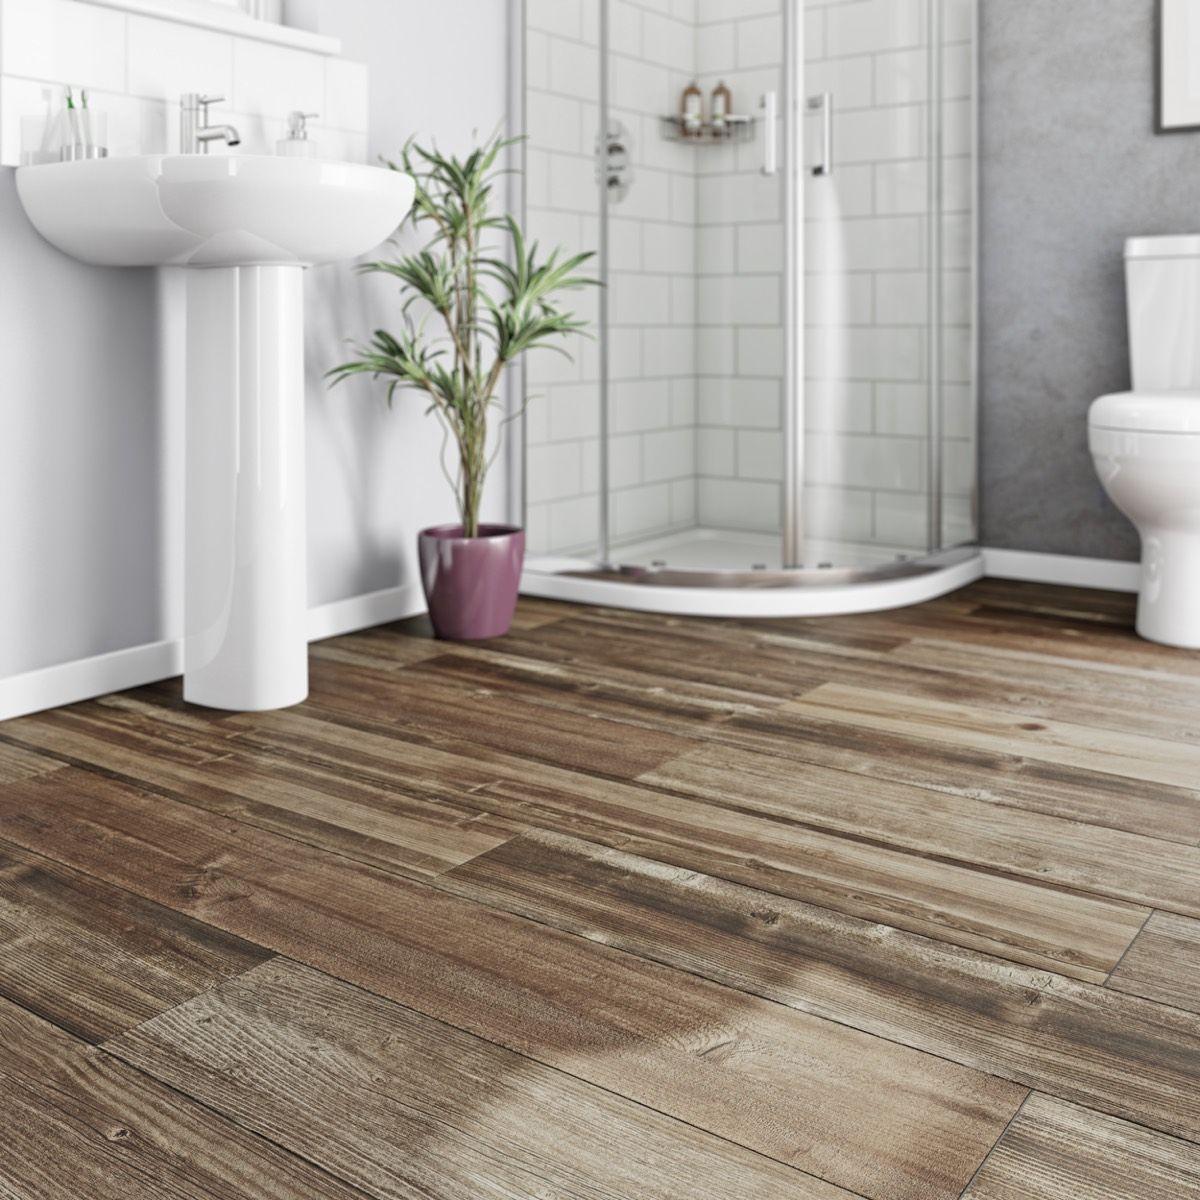 - £36.35 | Vinyl flooring, Vinyl flooring bathroom, Flooring